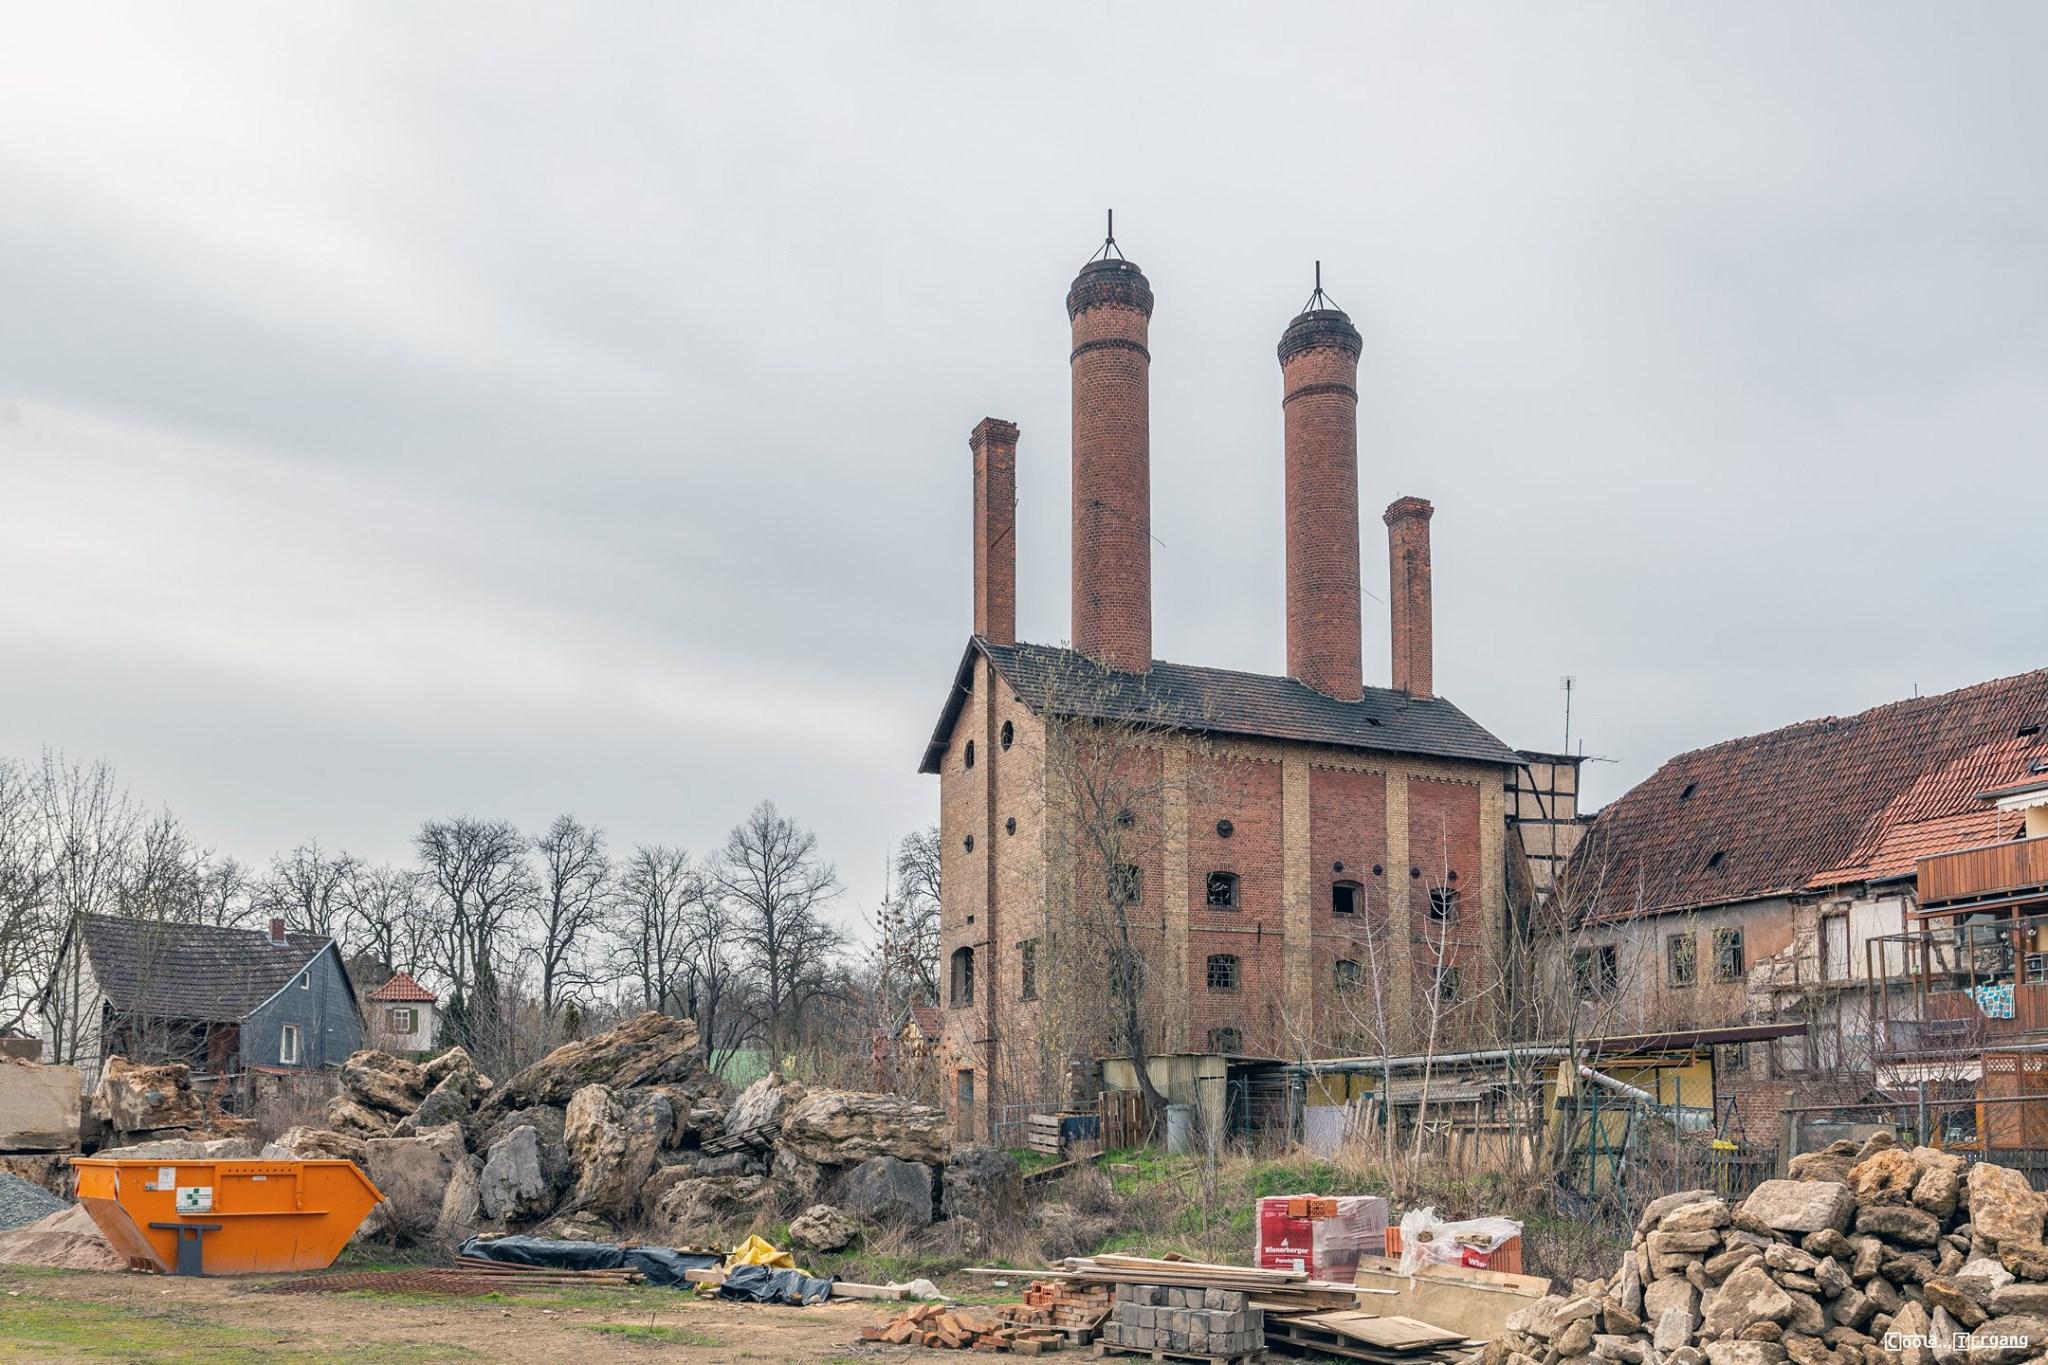 Malzfabrik Bad Langensalza